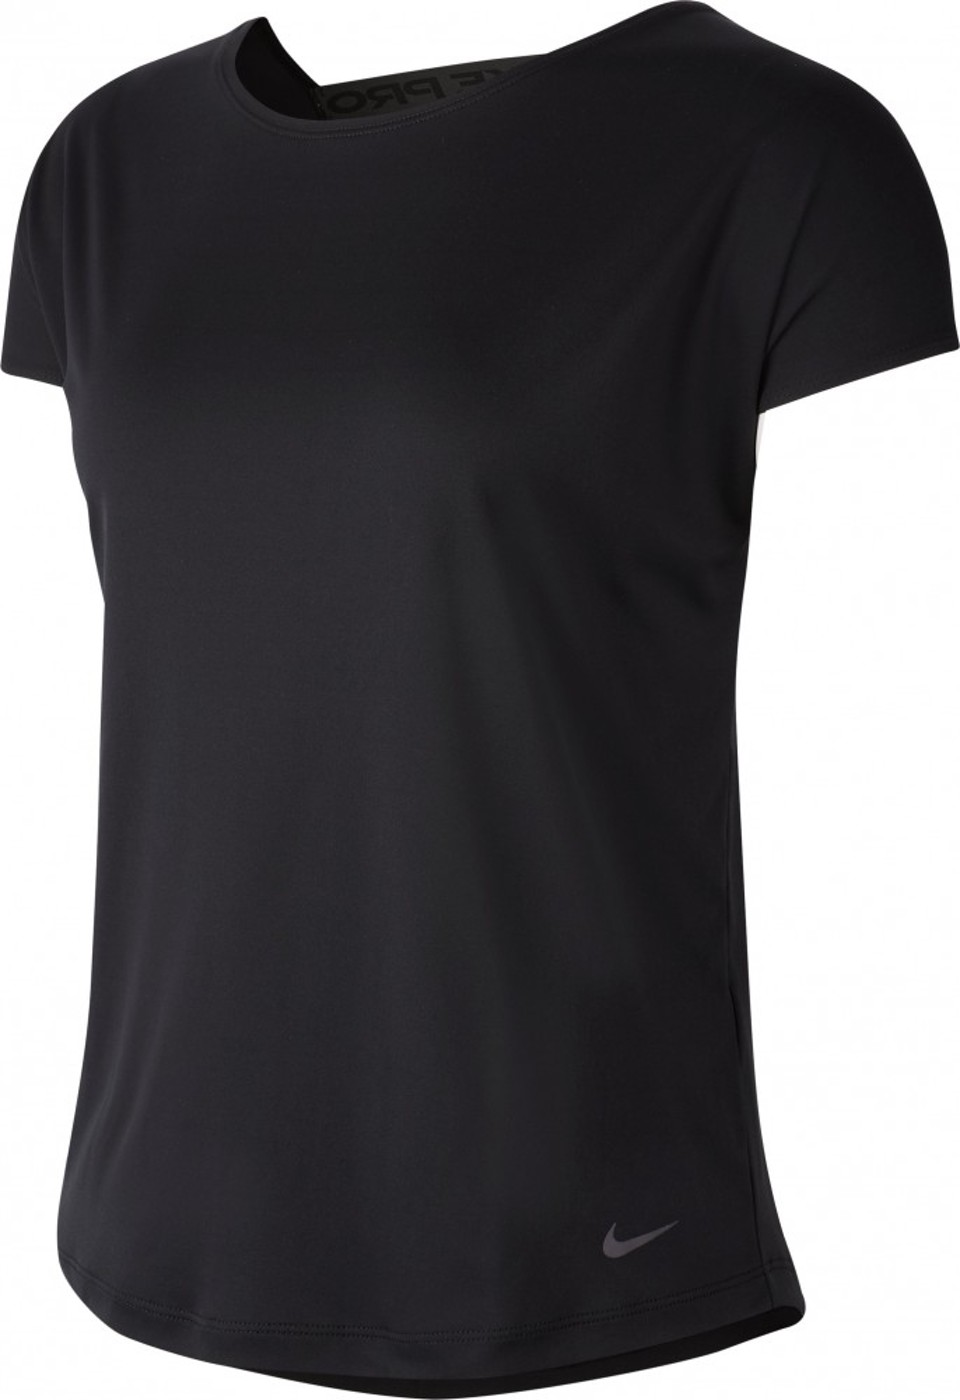 Nike Pro Dri-FIT Short - Damen